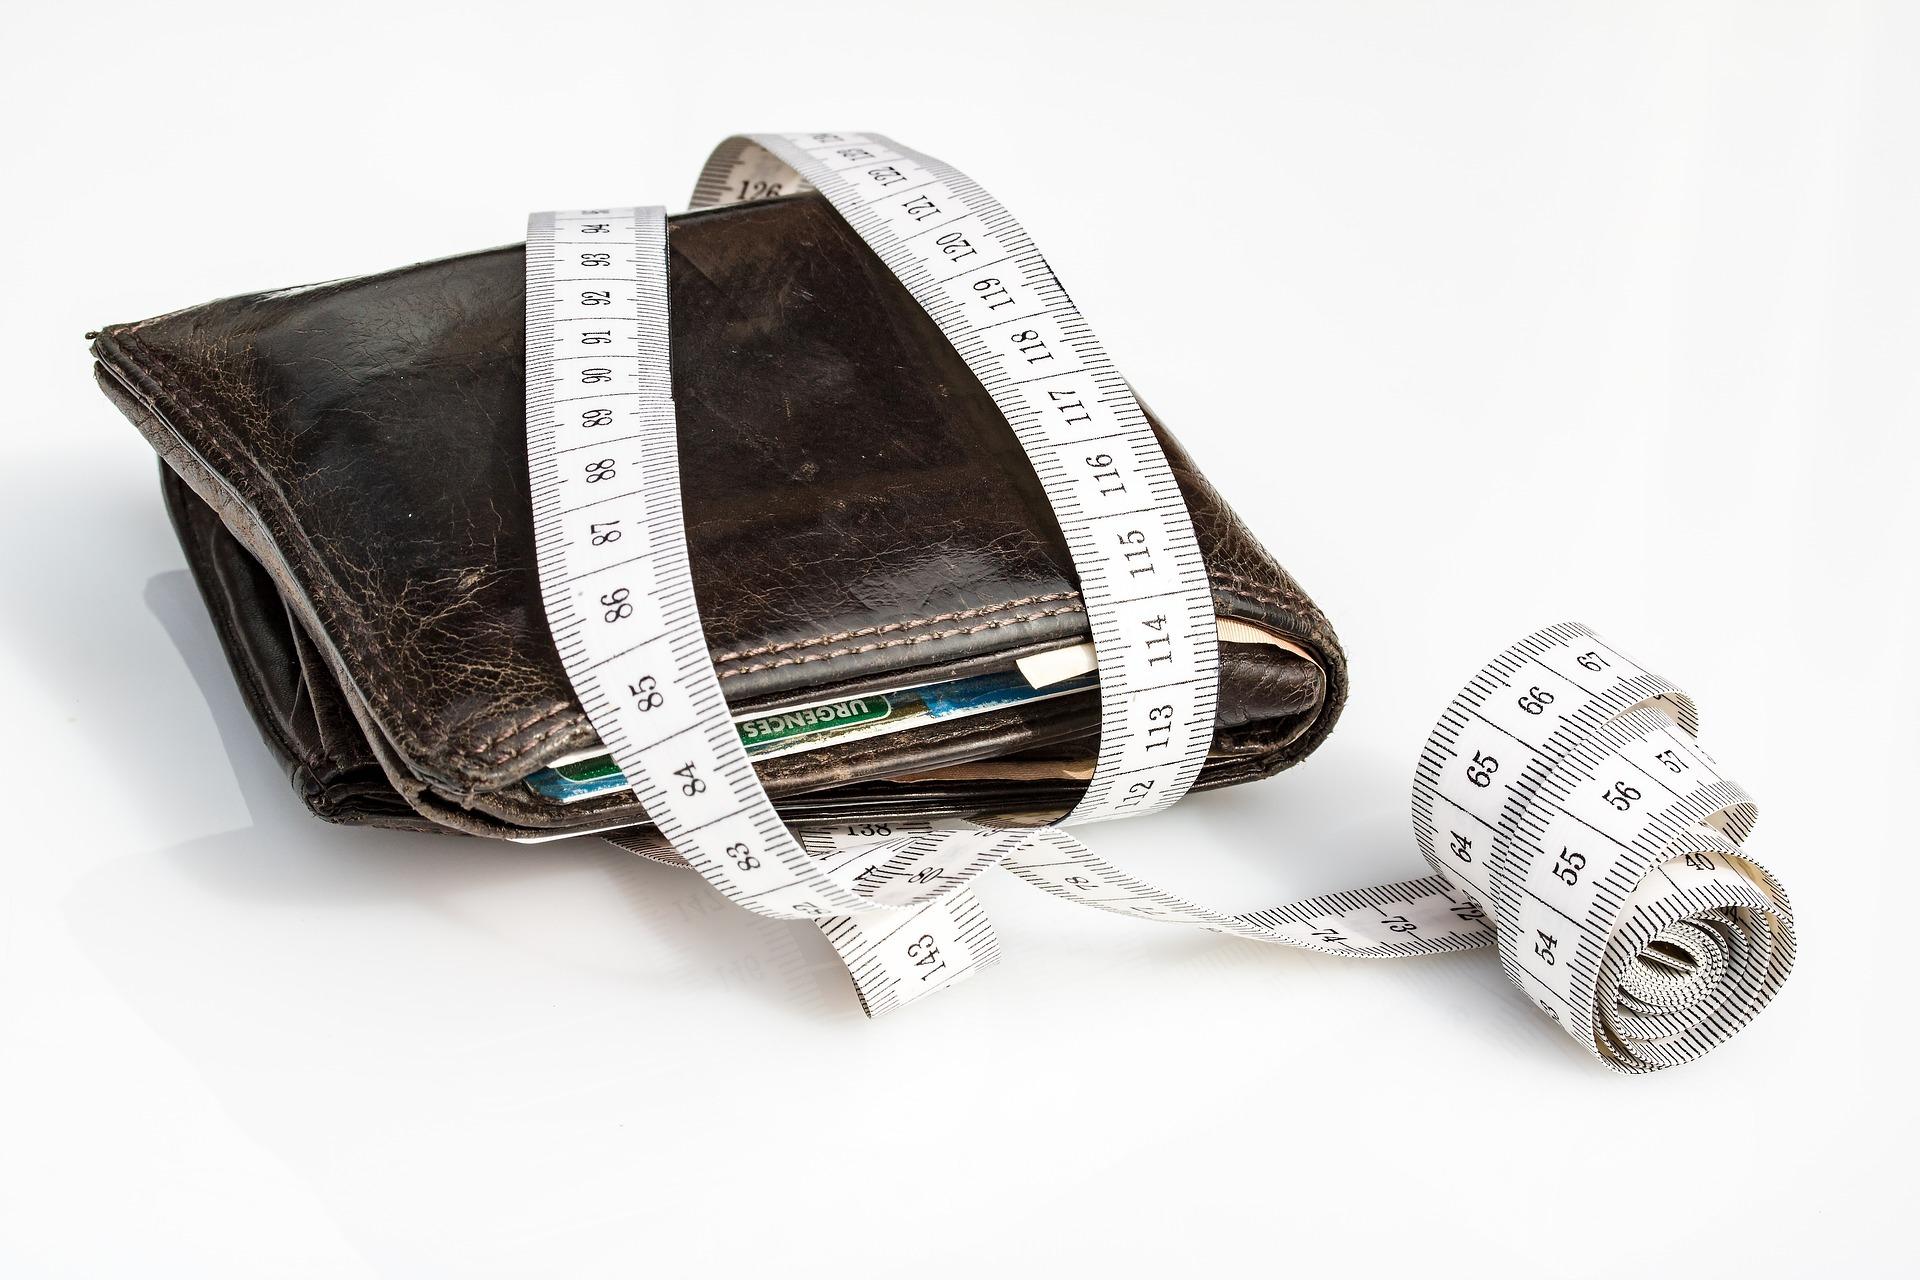 wallet-2383496_1920